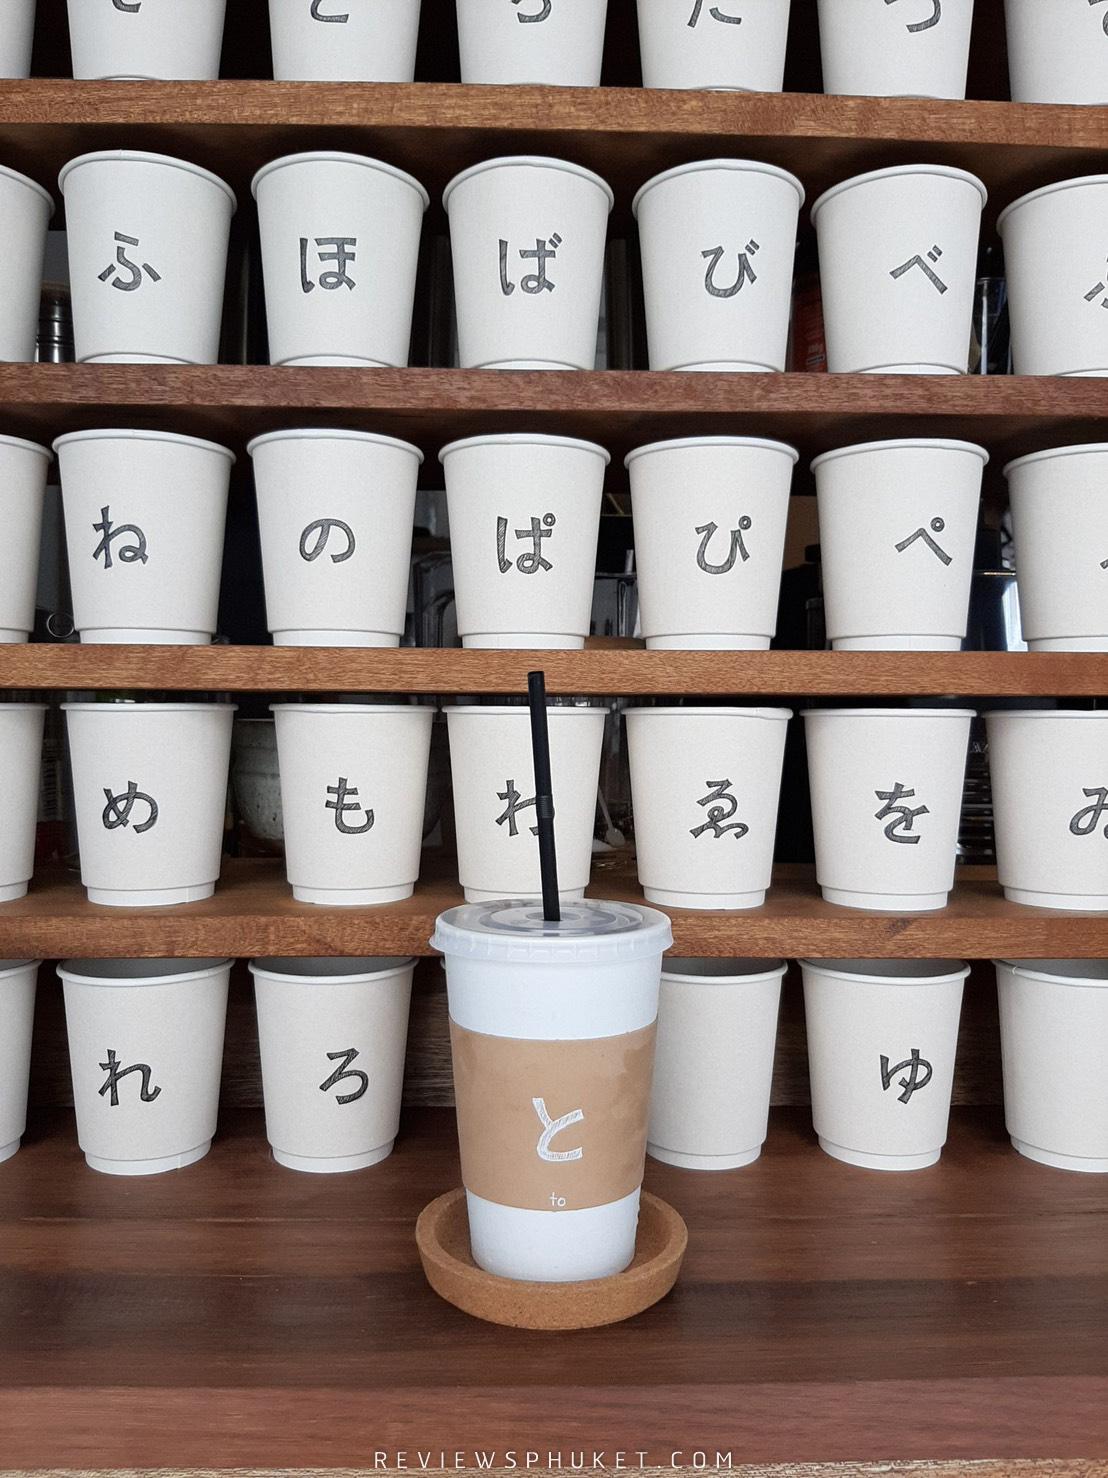 Hiraganacoffee